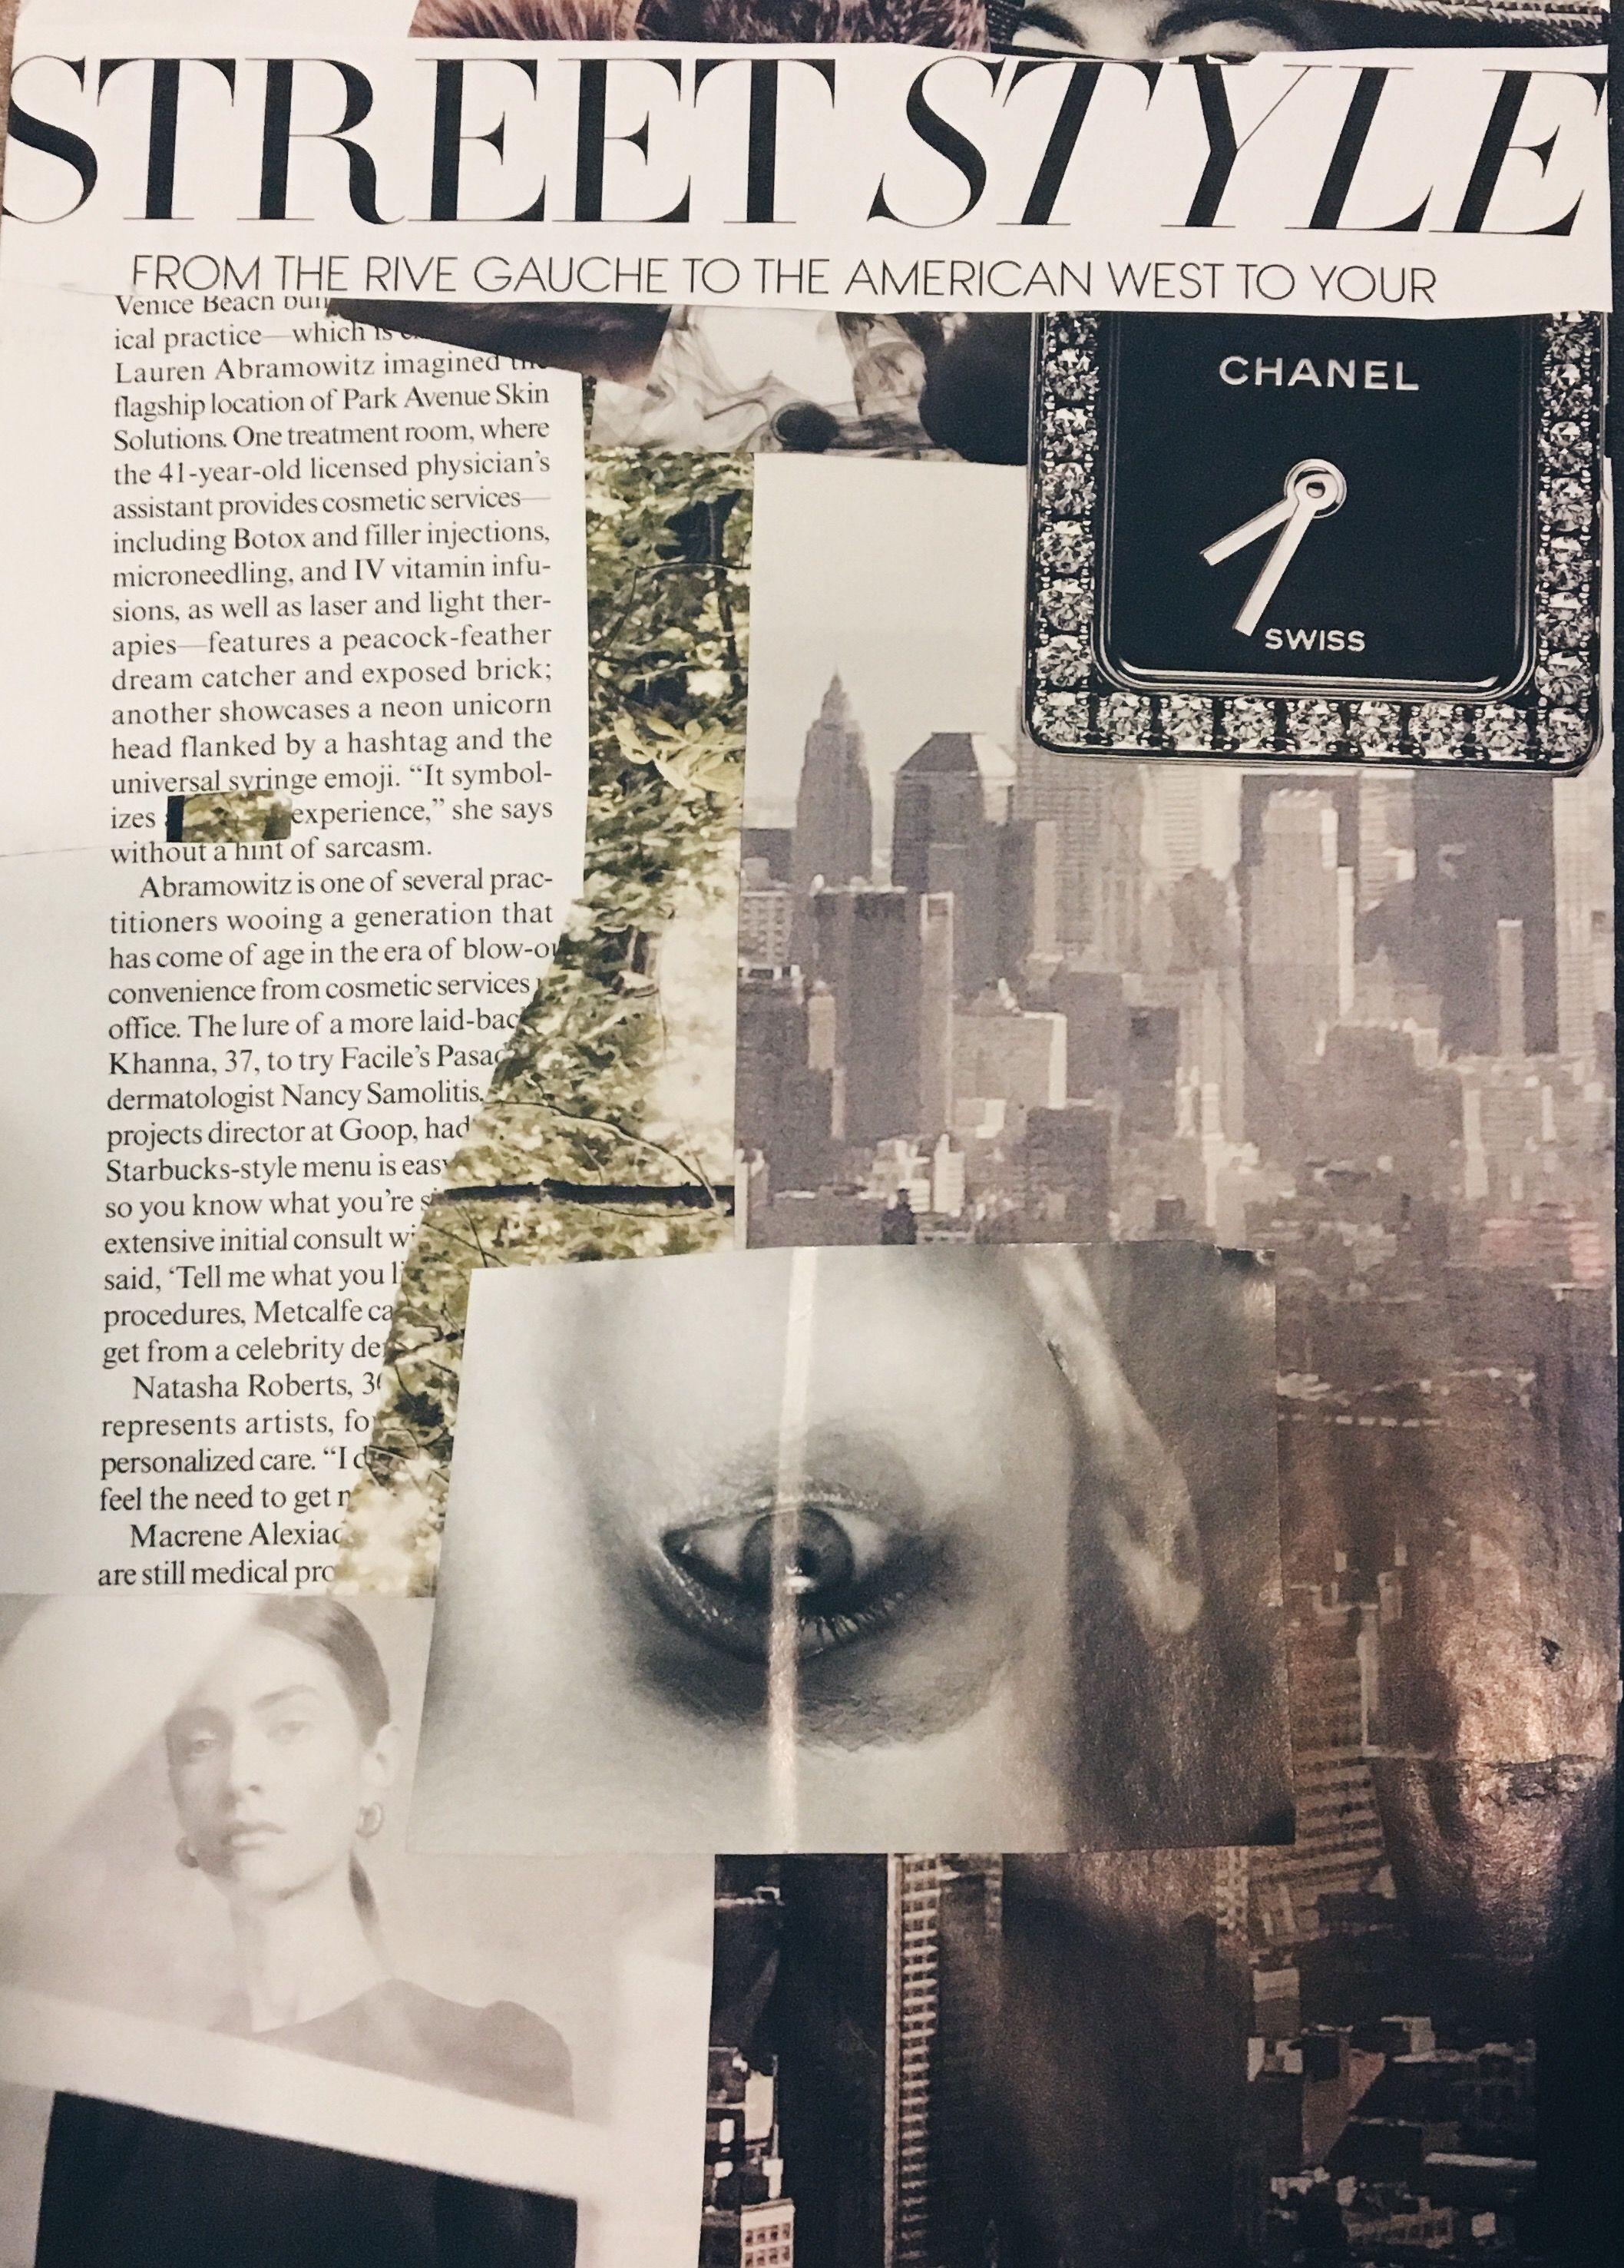 Chanel Wallpaper Iphonewallpaper Chanel Wallpapers